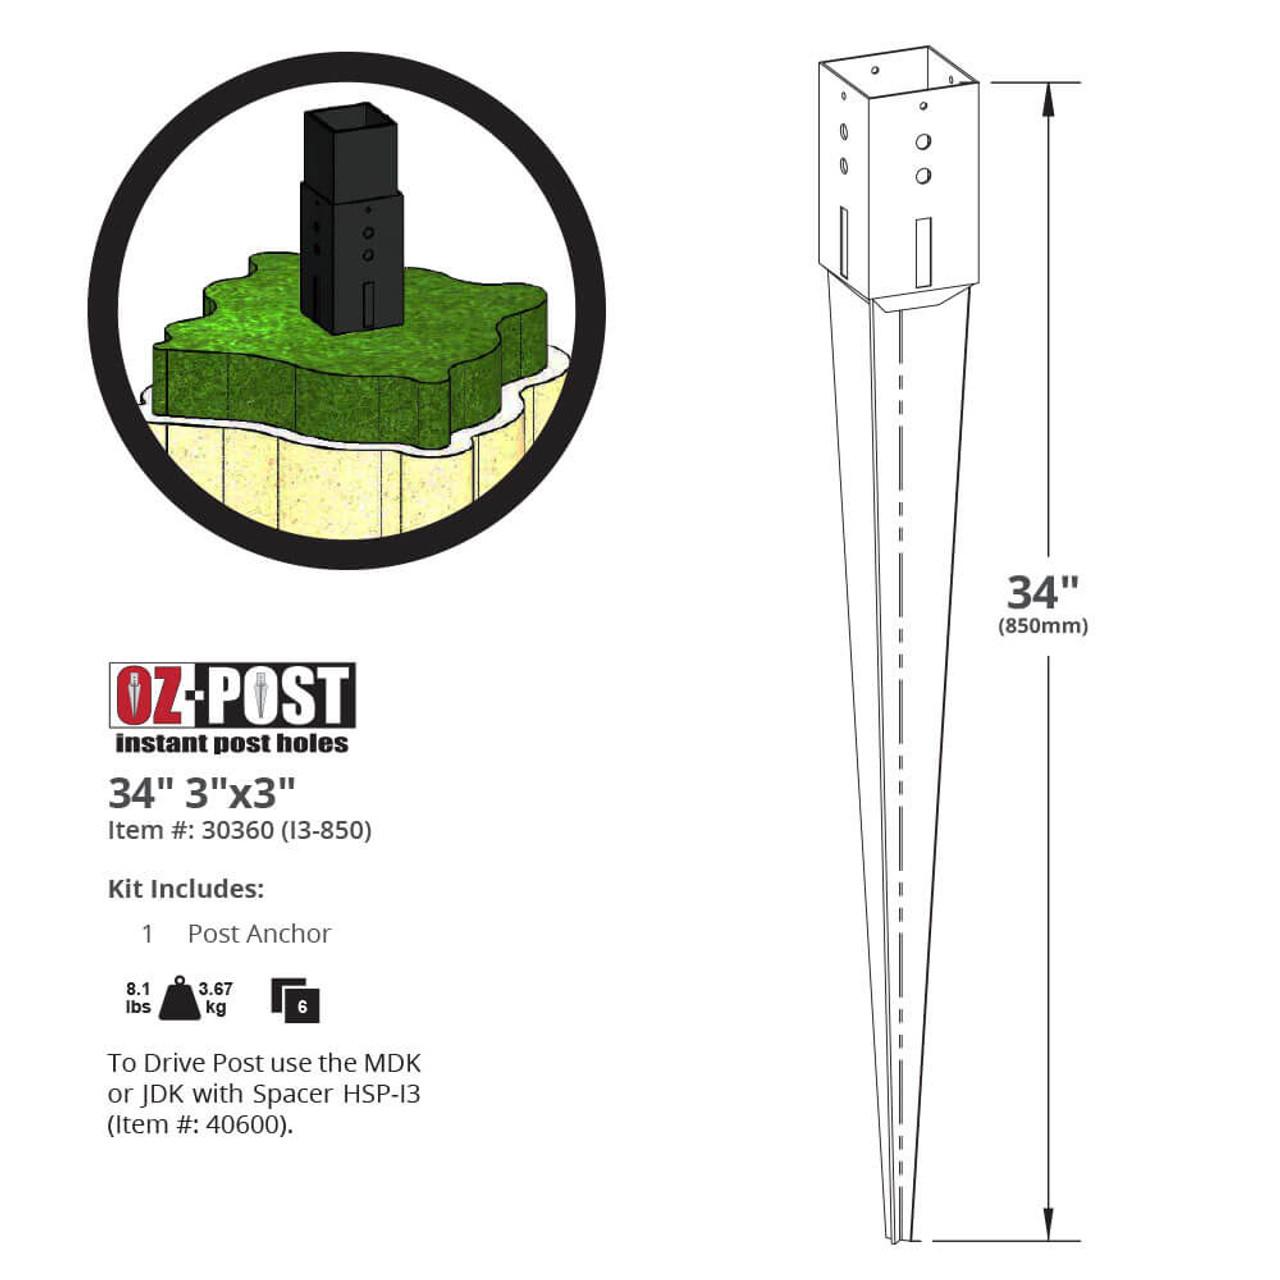 I3-850 OZ-Post Dimension Drawing